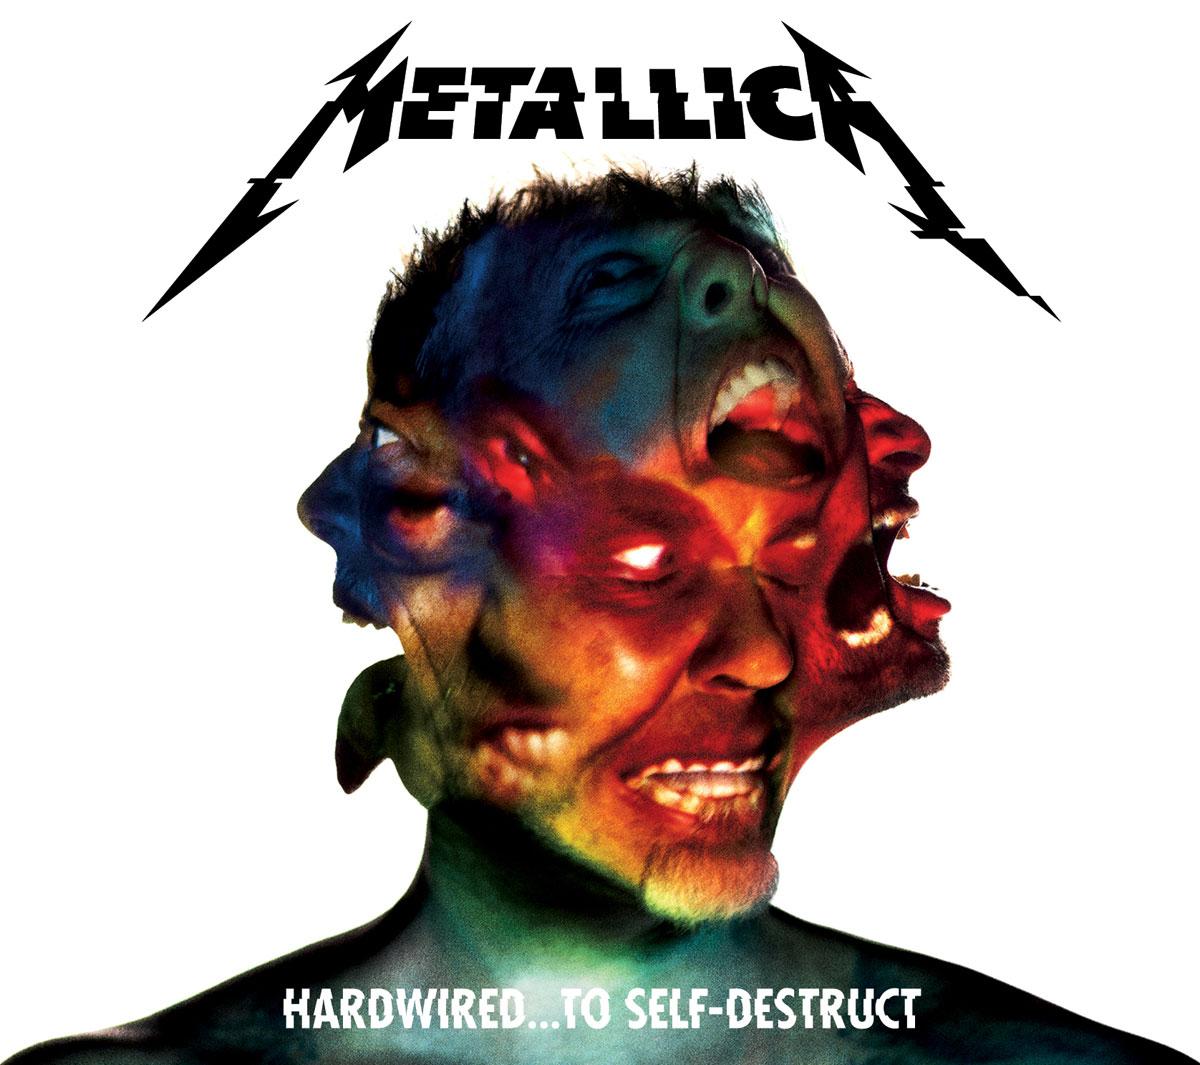 лучшая цена Metallica Metallica. Hardwired...To Self-Destruct. Deluxe (3 CD)